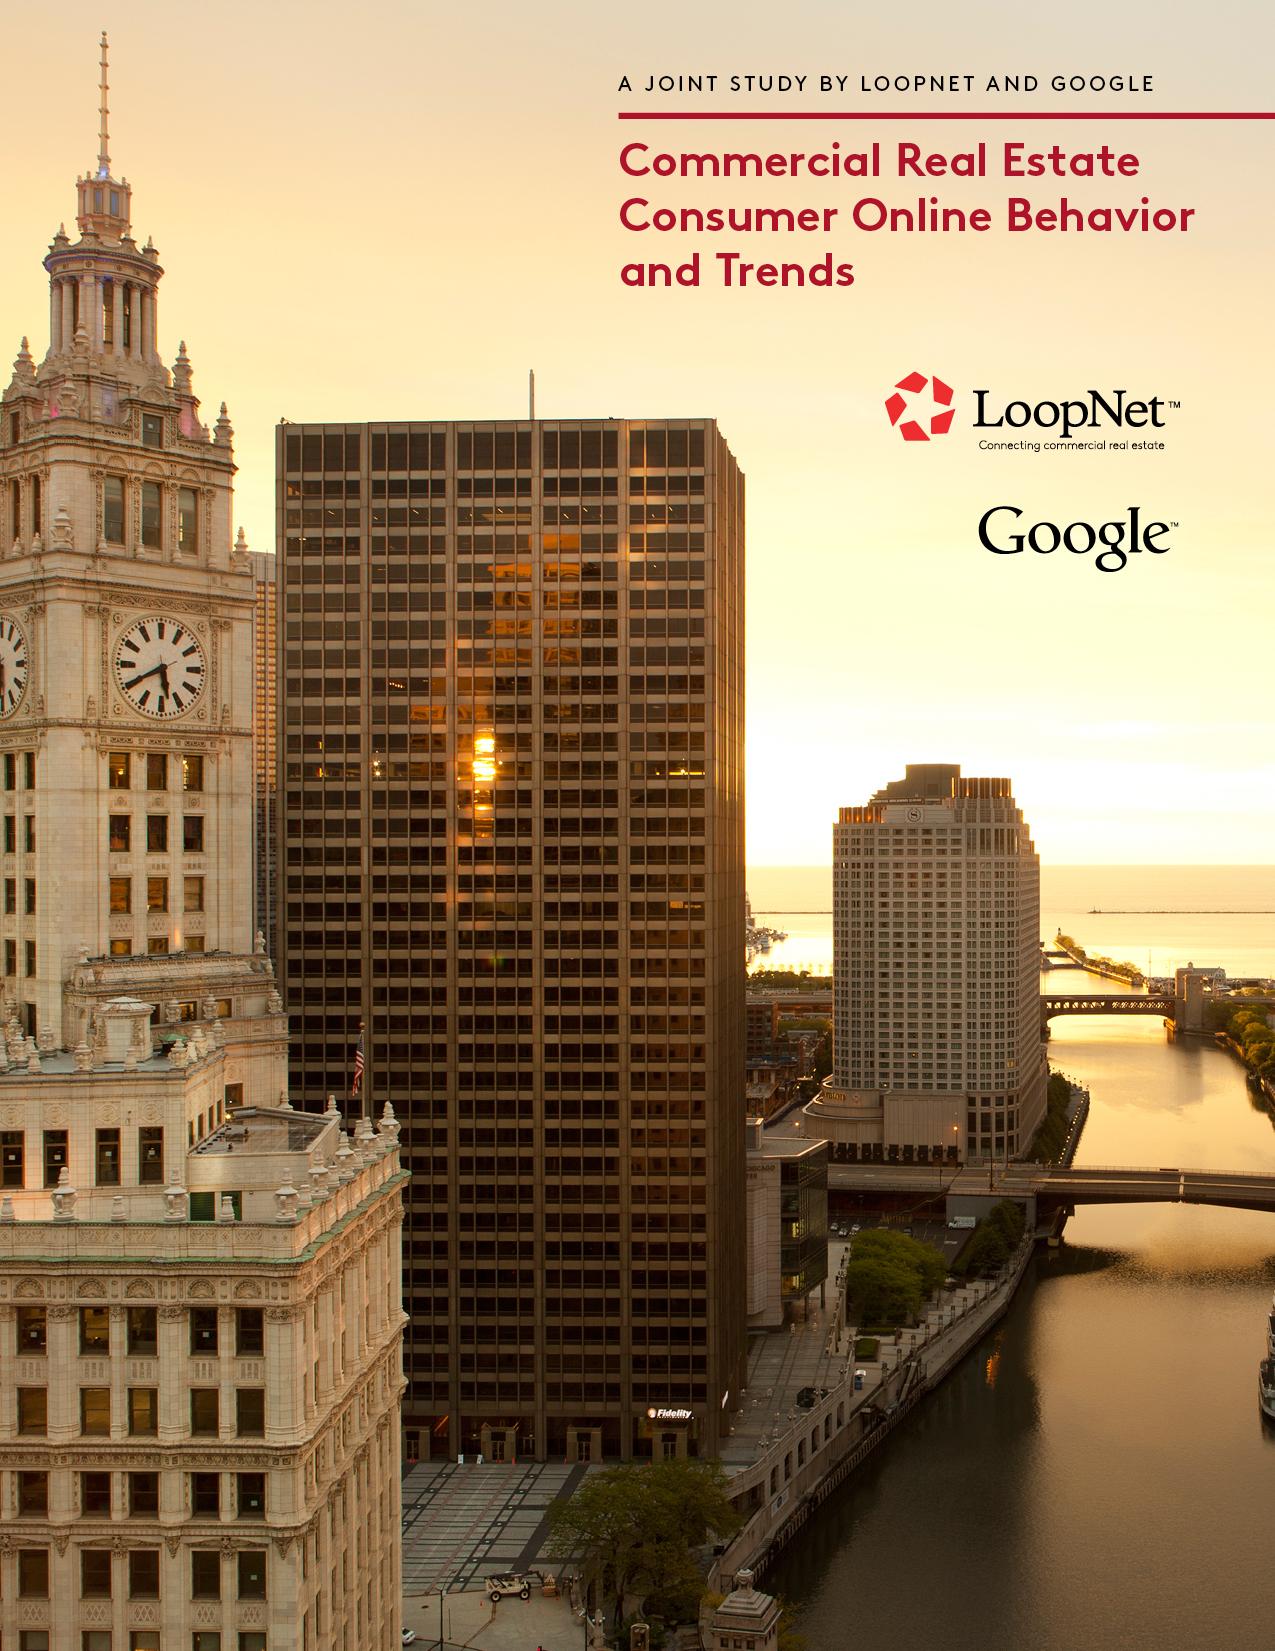 150dpi-LoopNet-Google-WhitePaper-Final.jpg